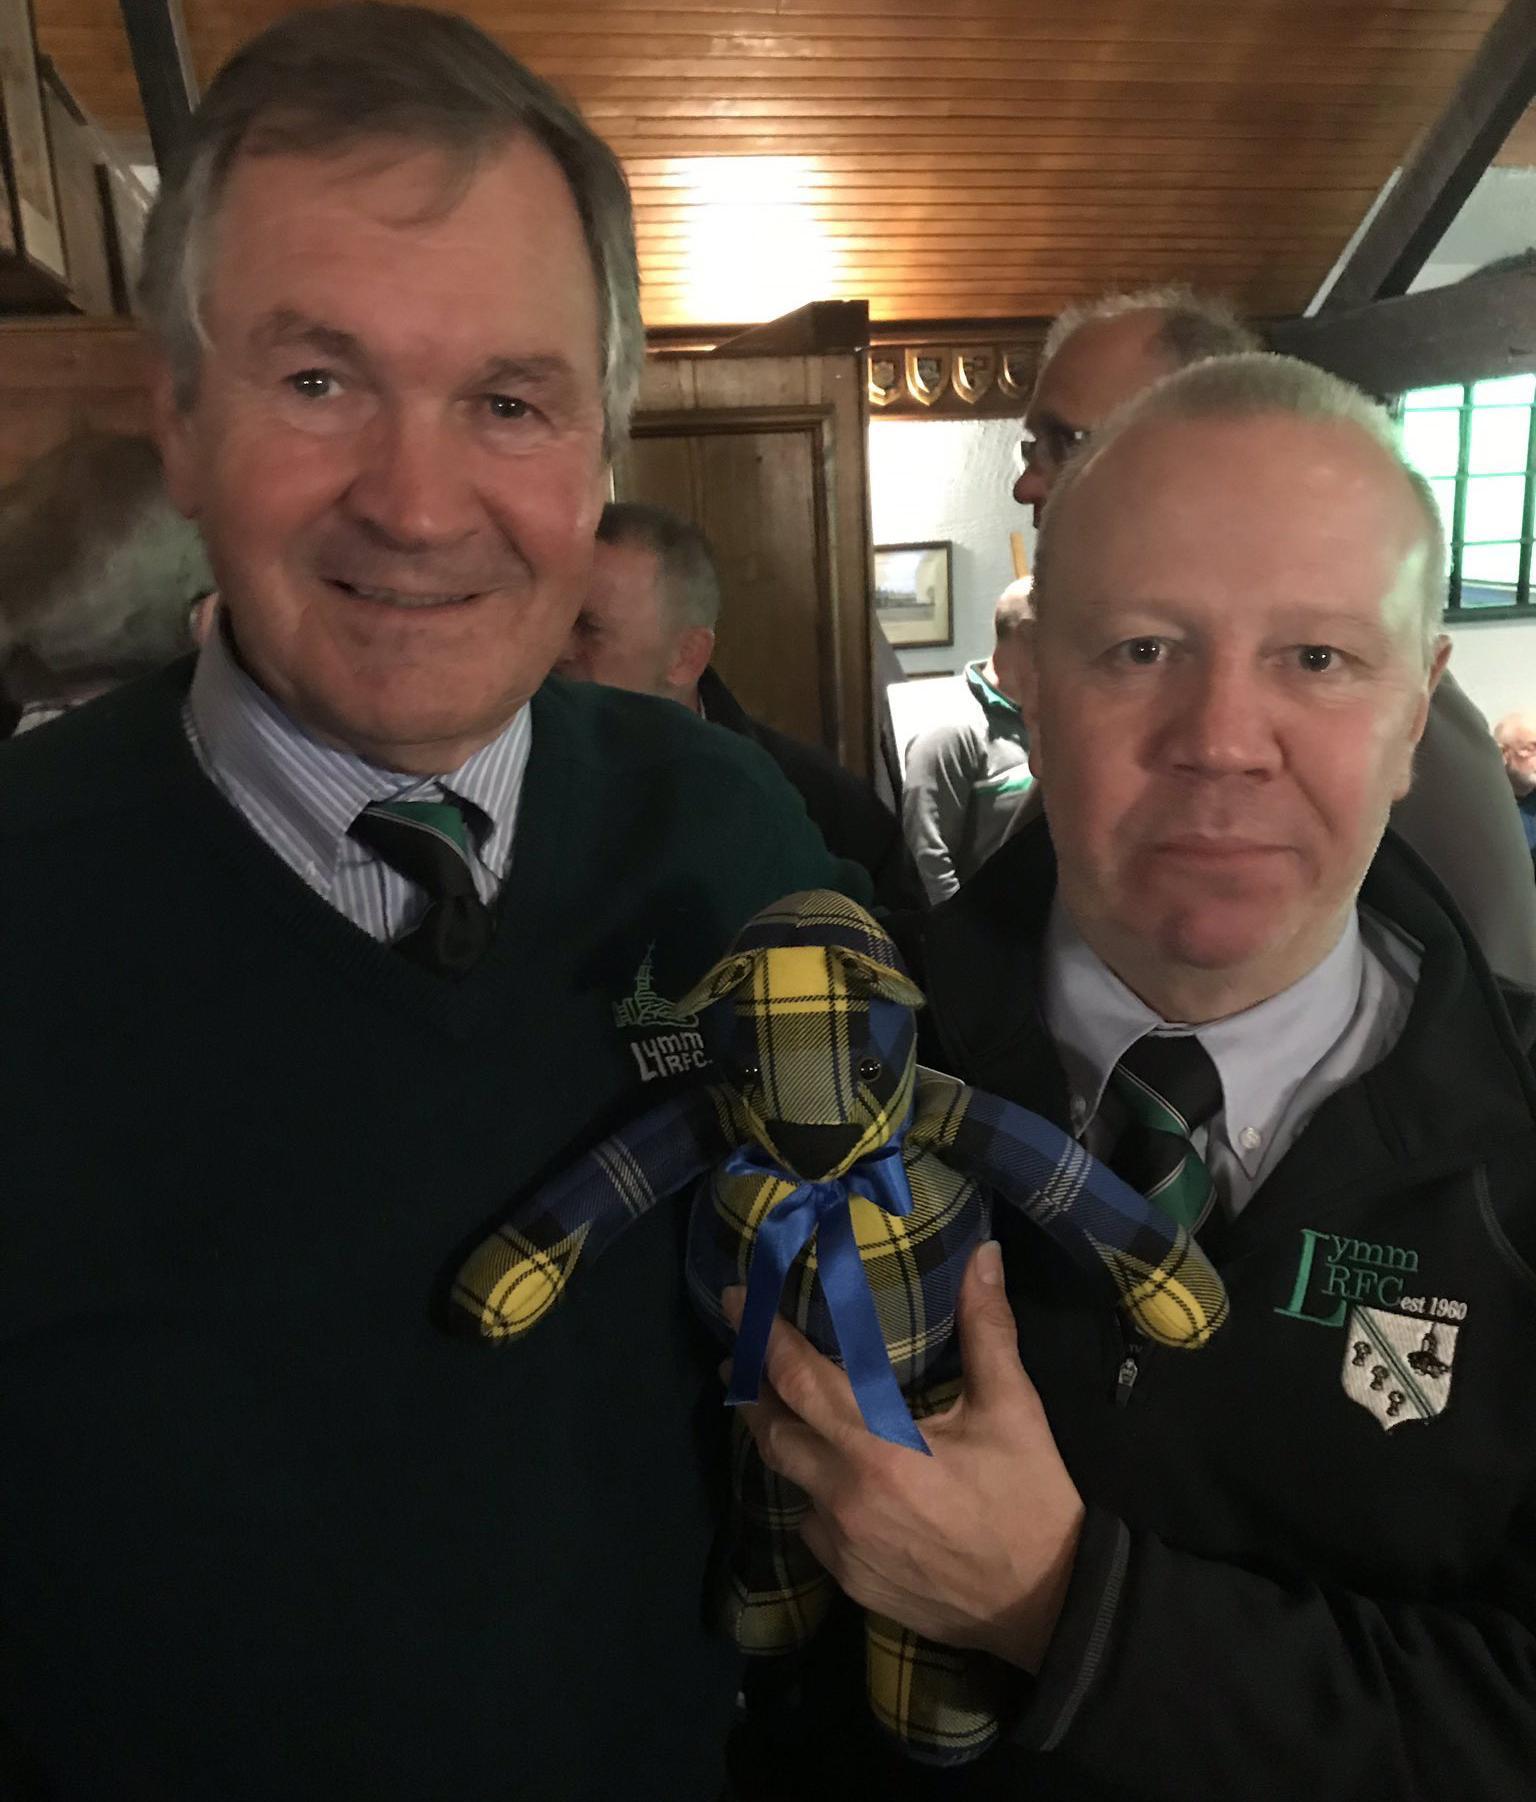 Doddie'5 Tartan Ted - Lymm RFC